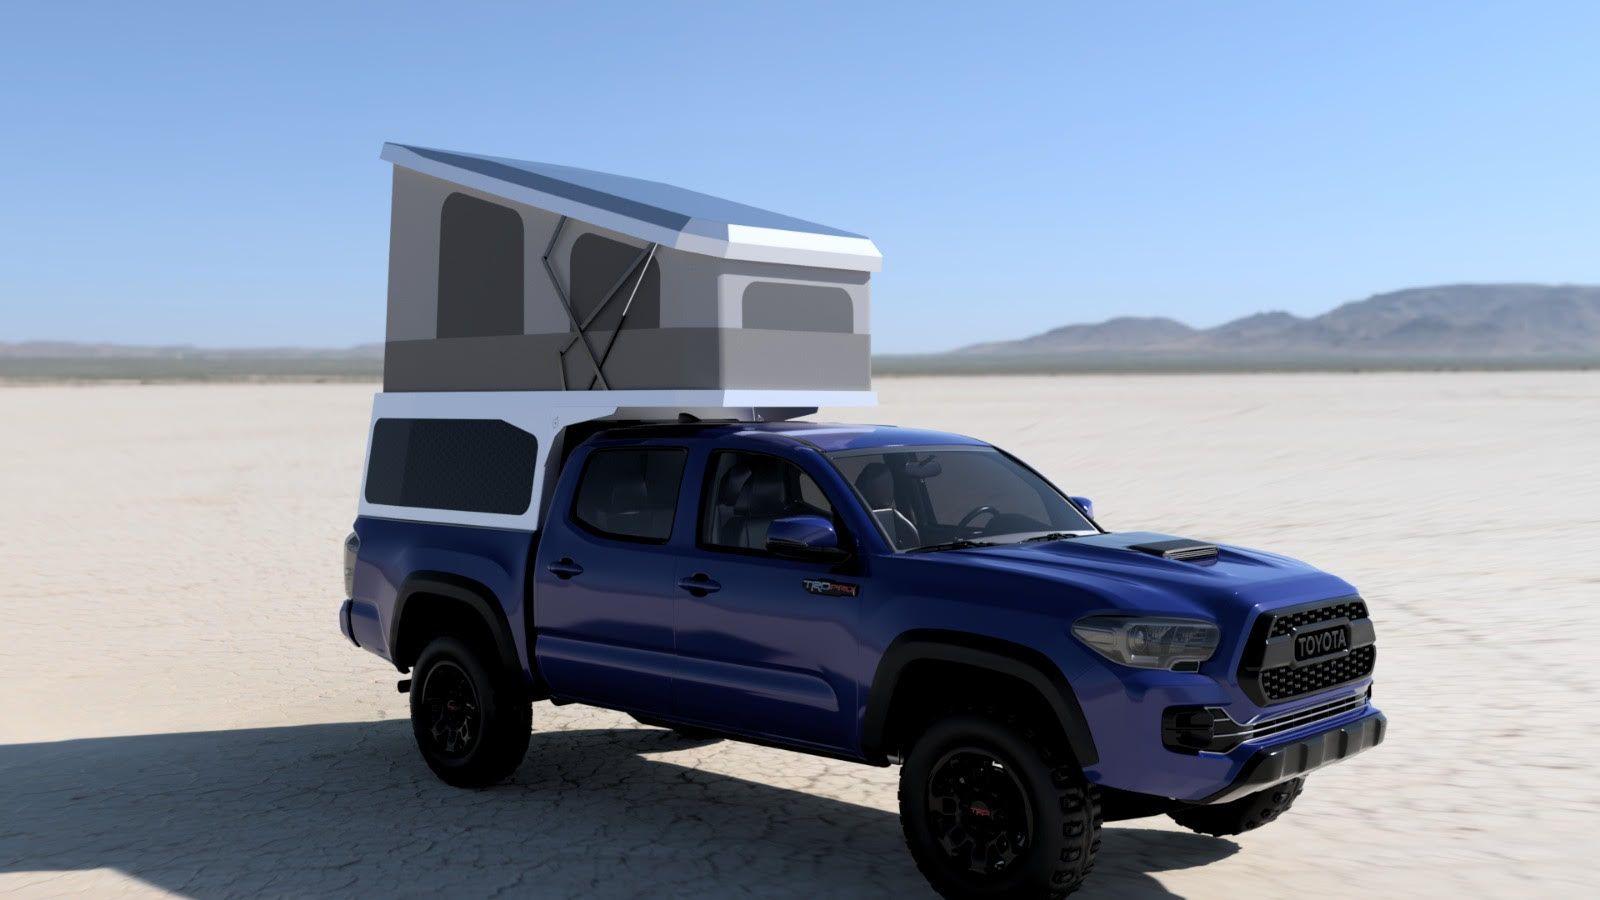 Leentu S 300 Pound Customizable Pop Up Camper Fits Trucks